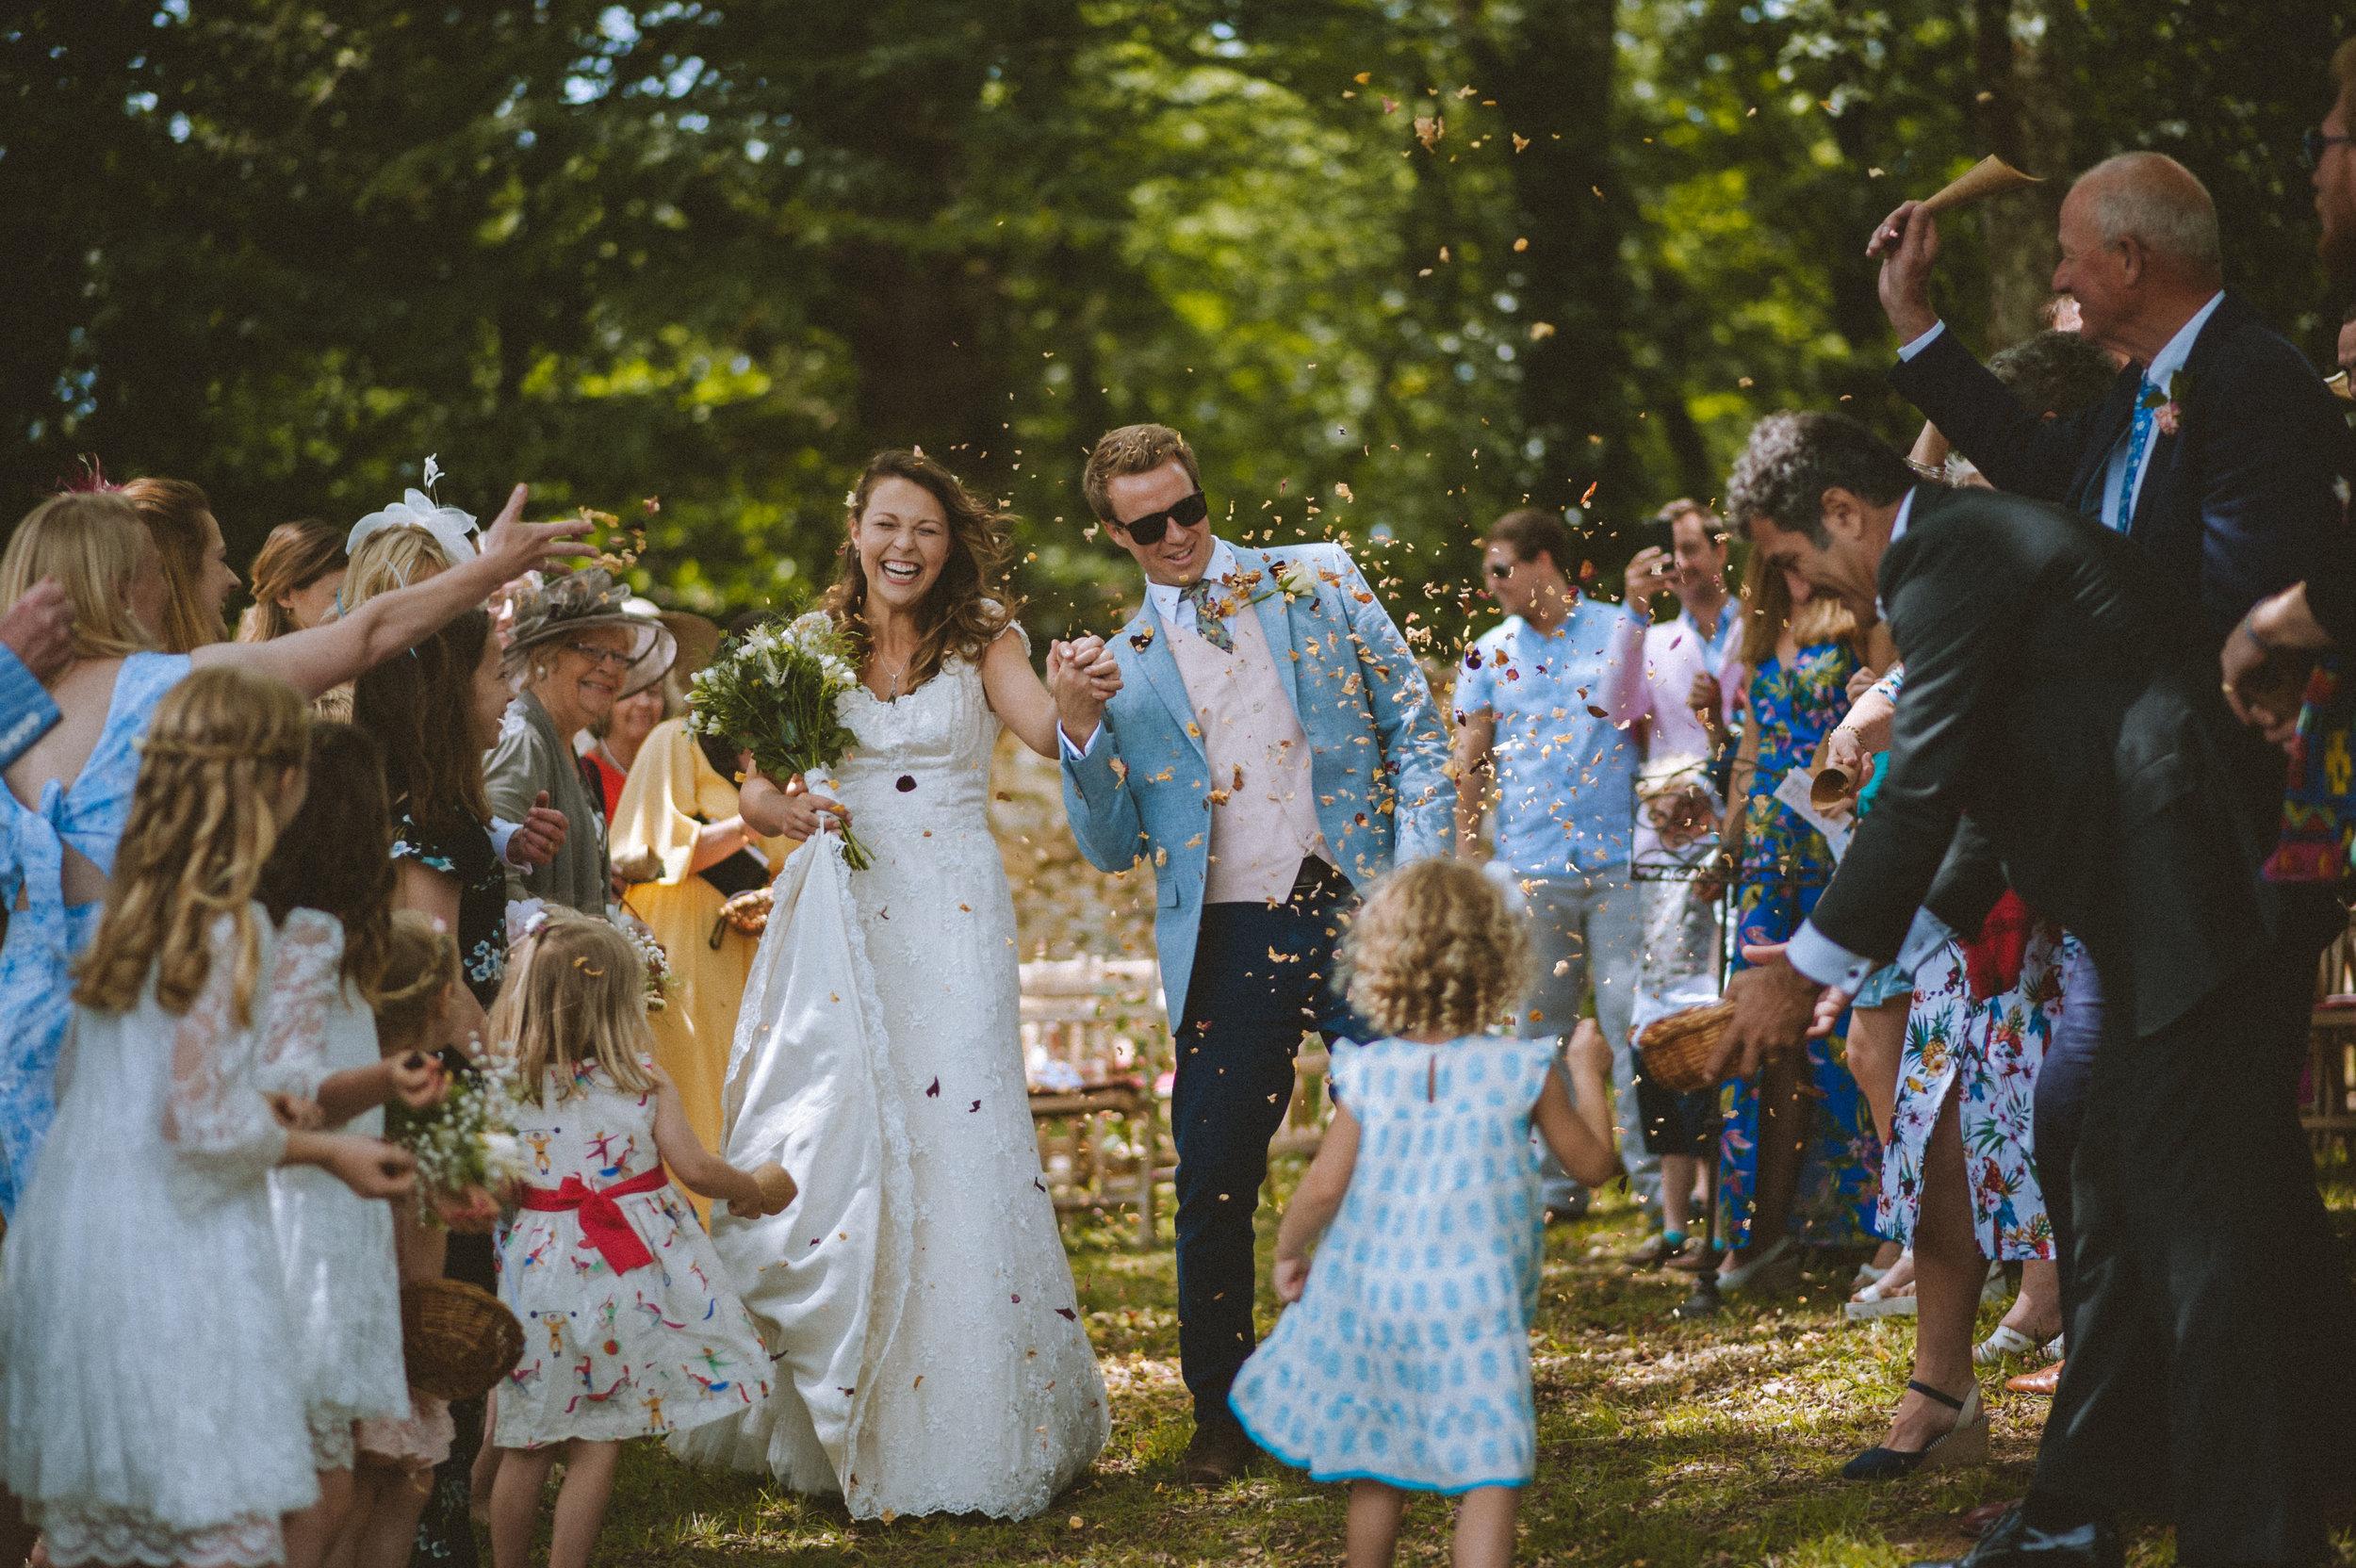 wedding-photographer-dordogne-mark-shaw-4.jpg